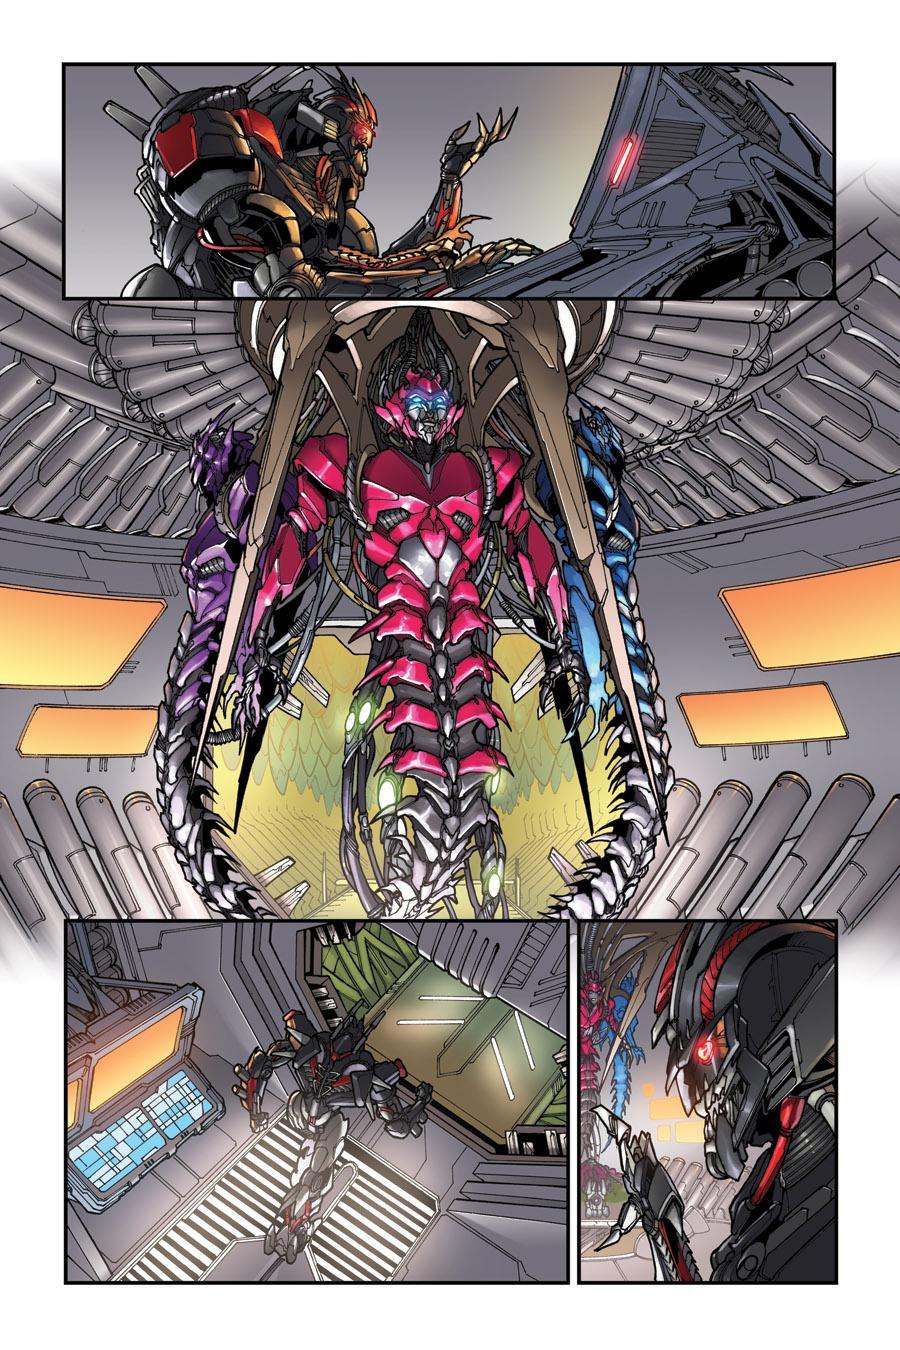 TotF 6 Page 3 by dyemooch